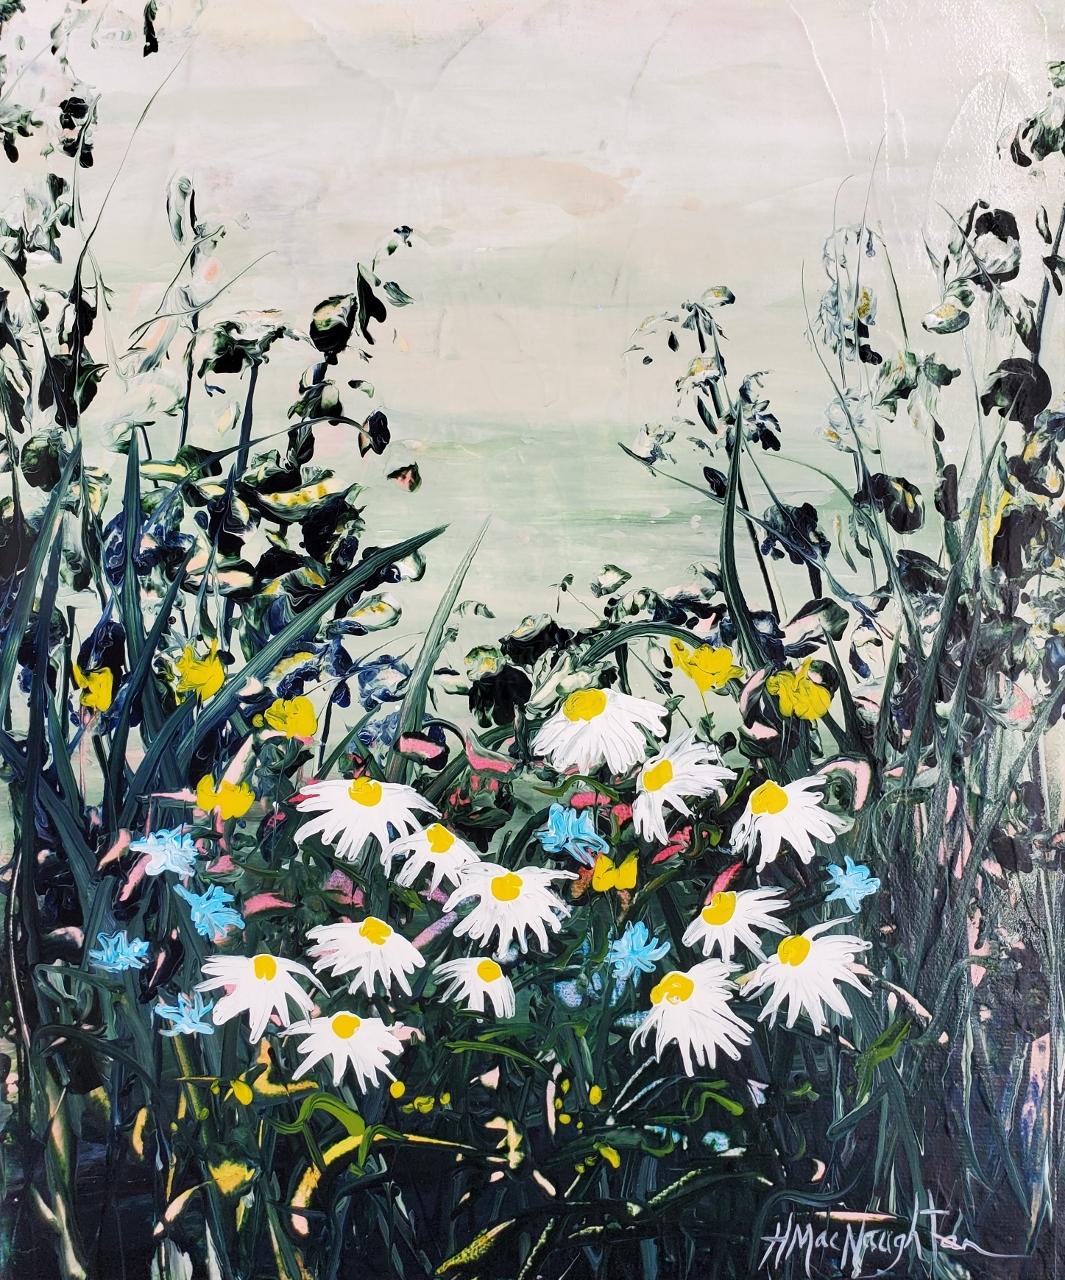 Artist Hanna MacNaughtan